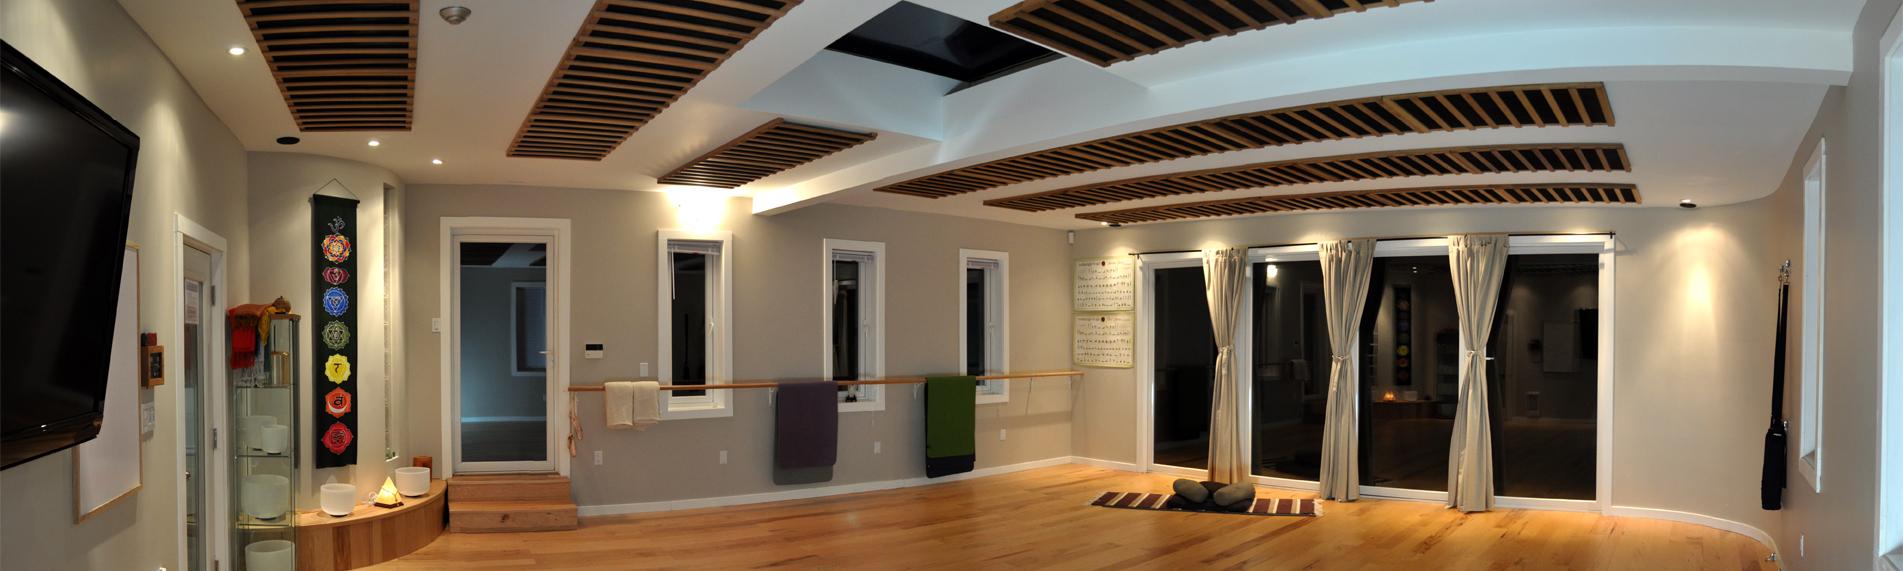 My Hot Yoga Studio